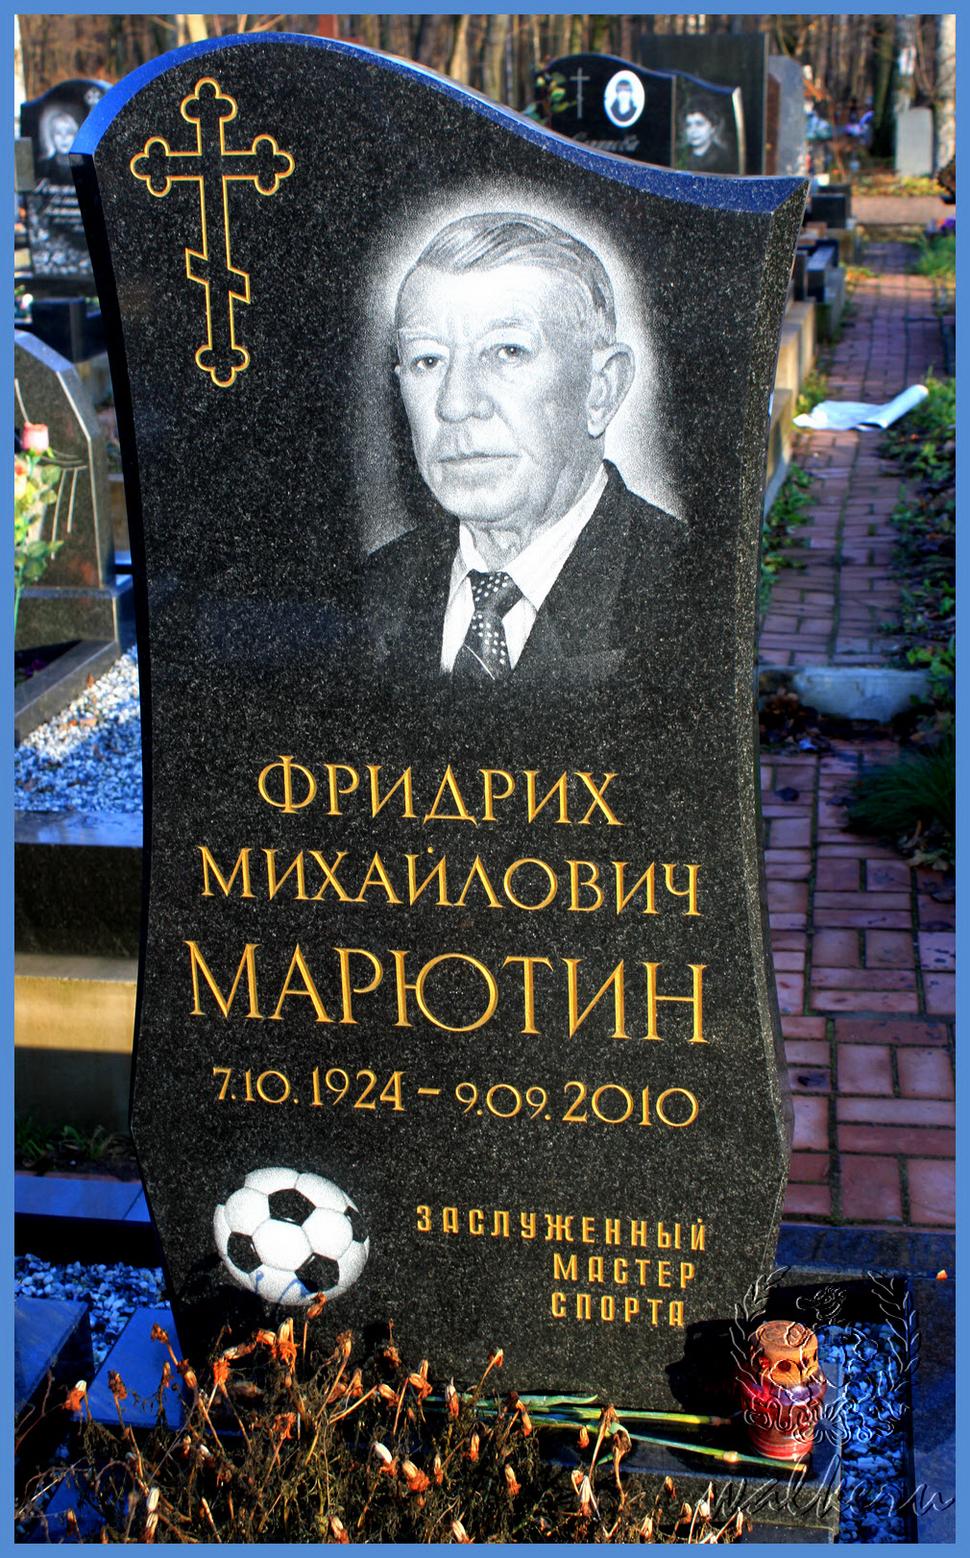 © Марютин Фридрих Михайлович